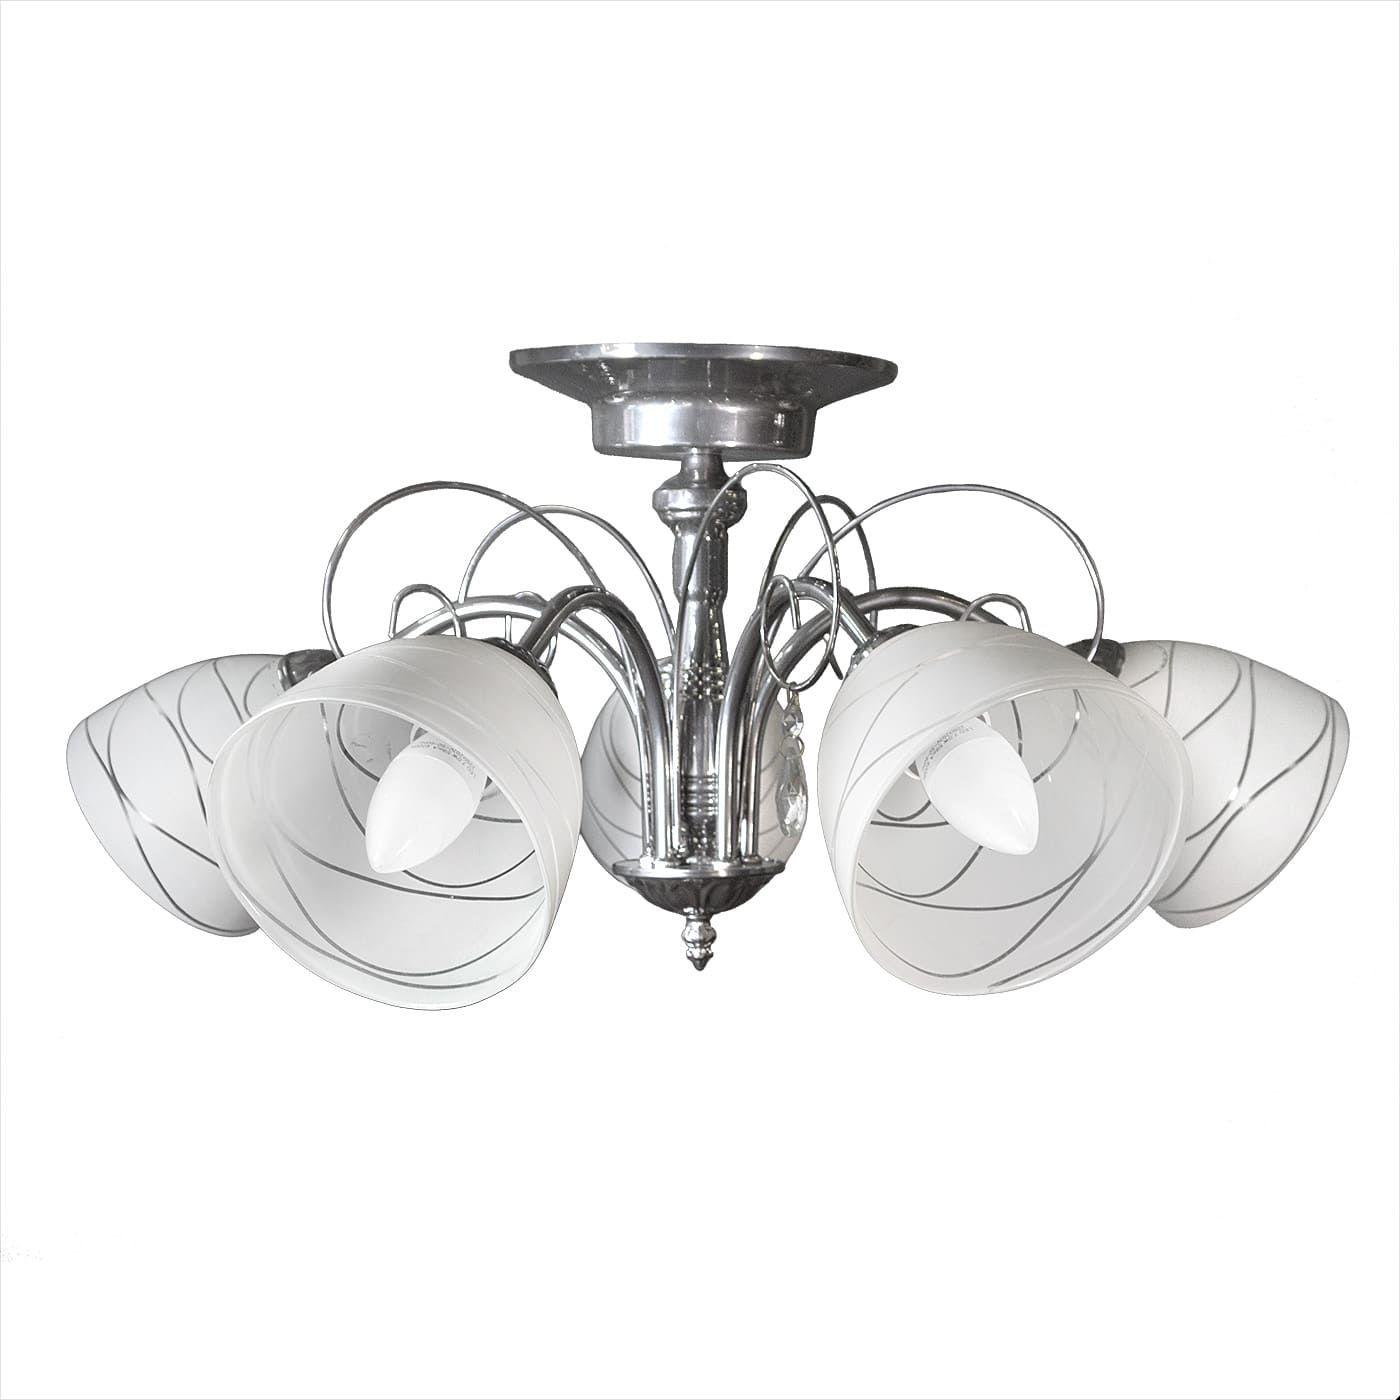 PETRASVET / Ceiling chandelier S2165-6, 6xE27 max. 60W